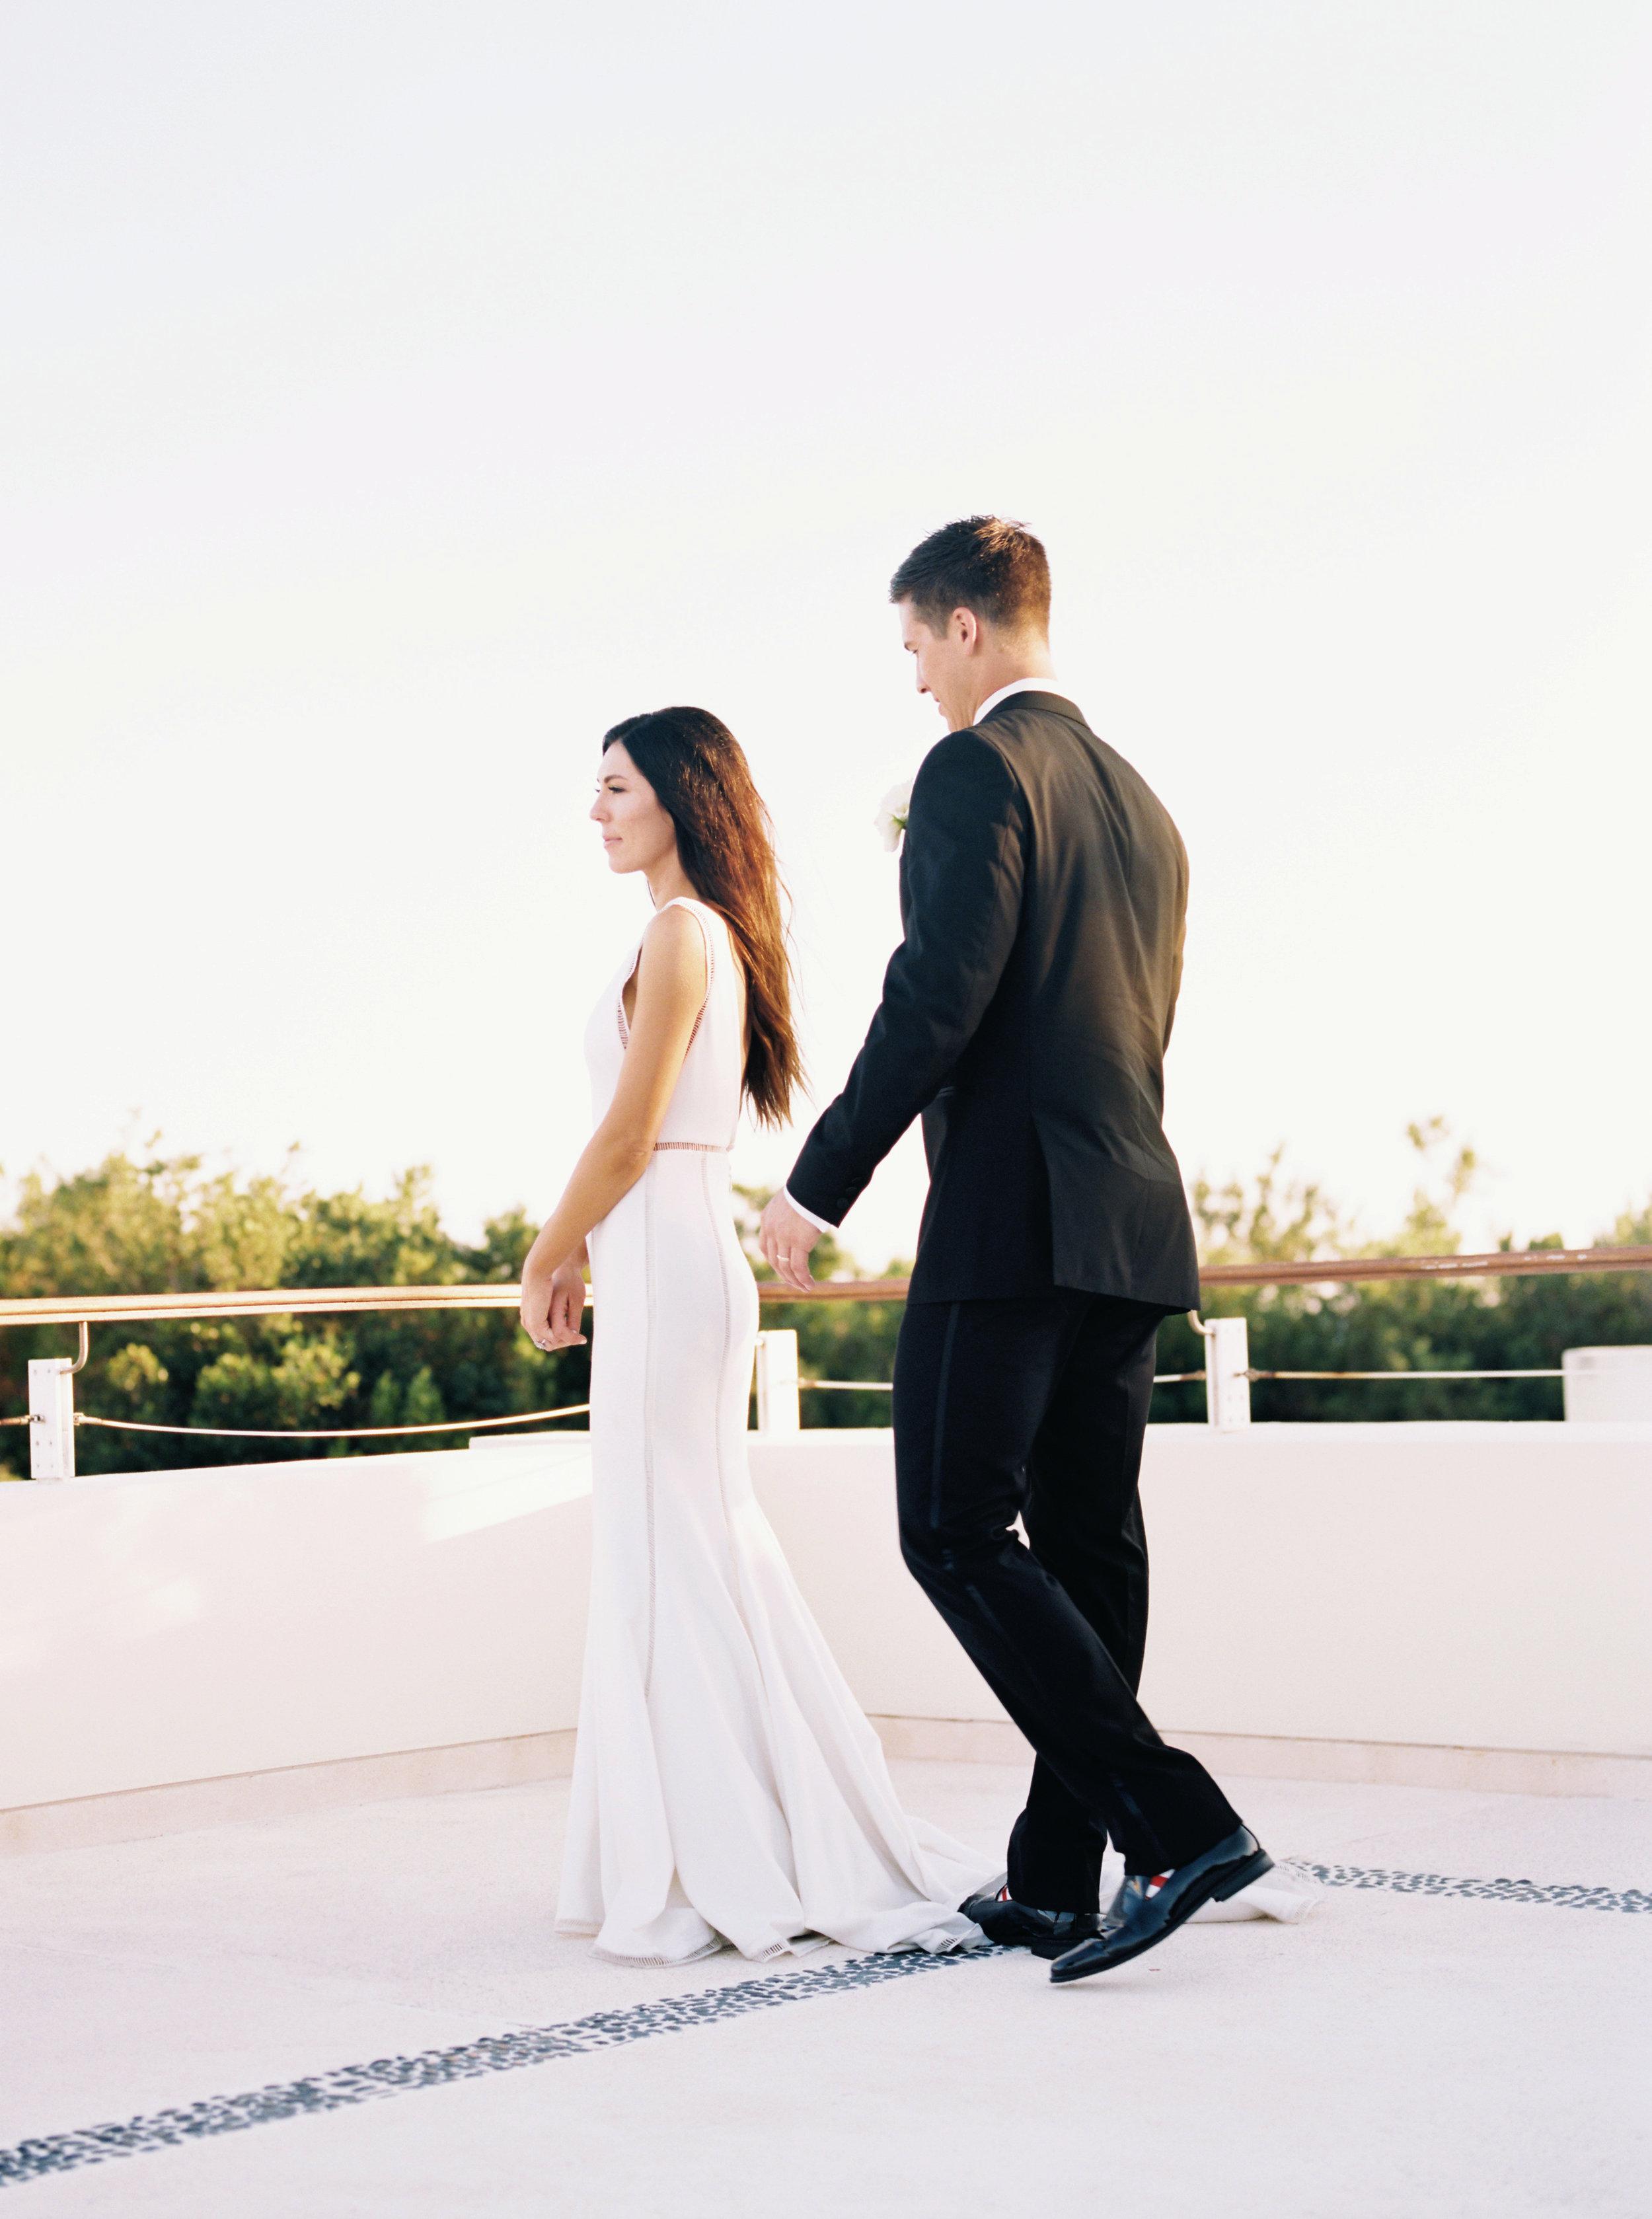 Kyle John l Fine Art Wedding Photography l Chicago, Copenhagen, California, New York, Destination l Blog l Brooke Boyd_The Film Poets_Tulum Wedding_34